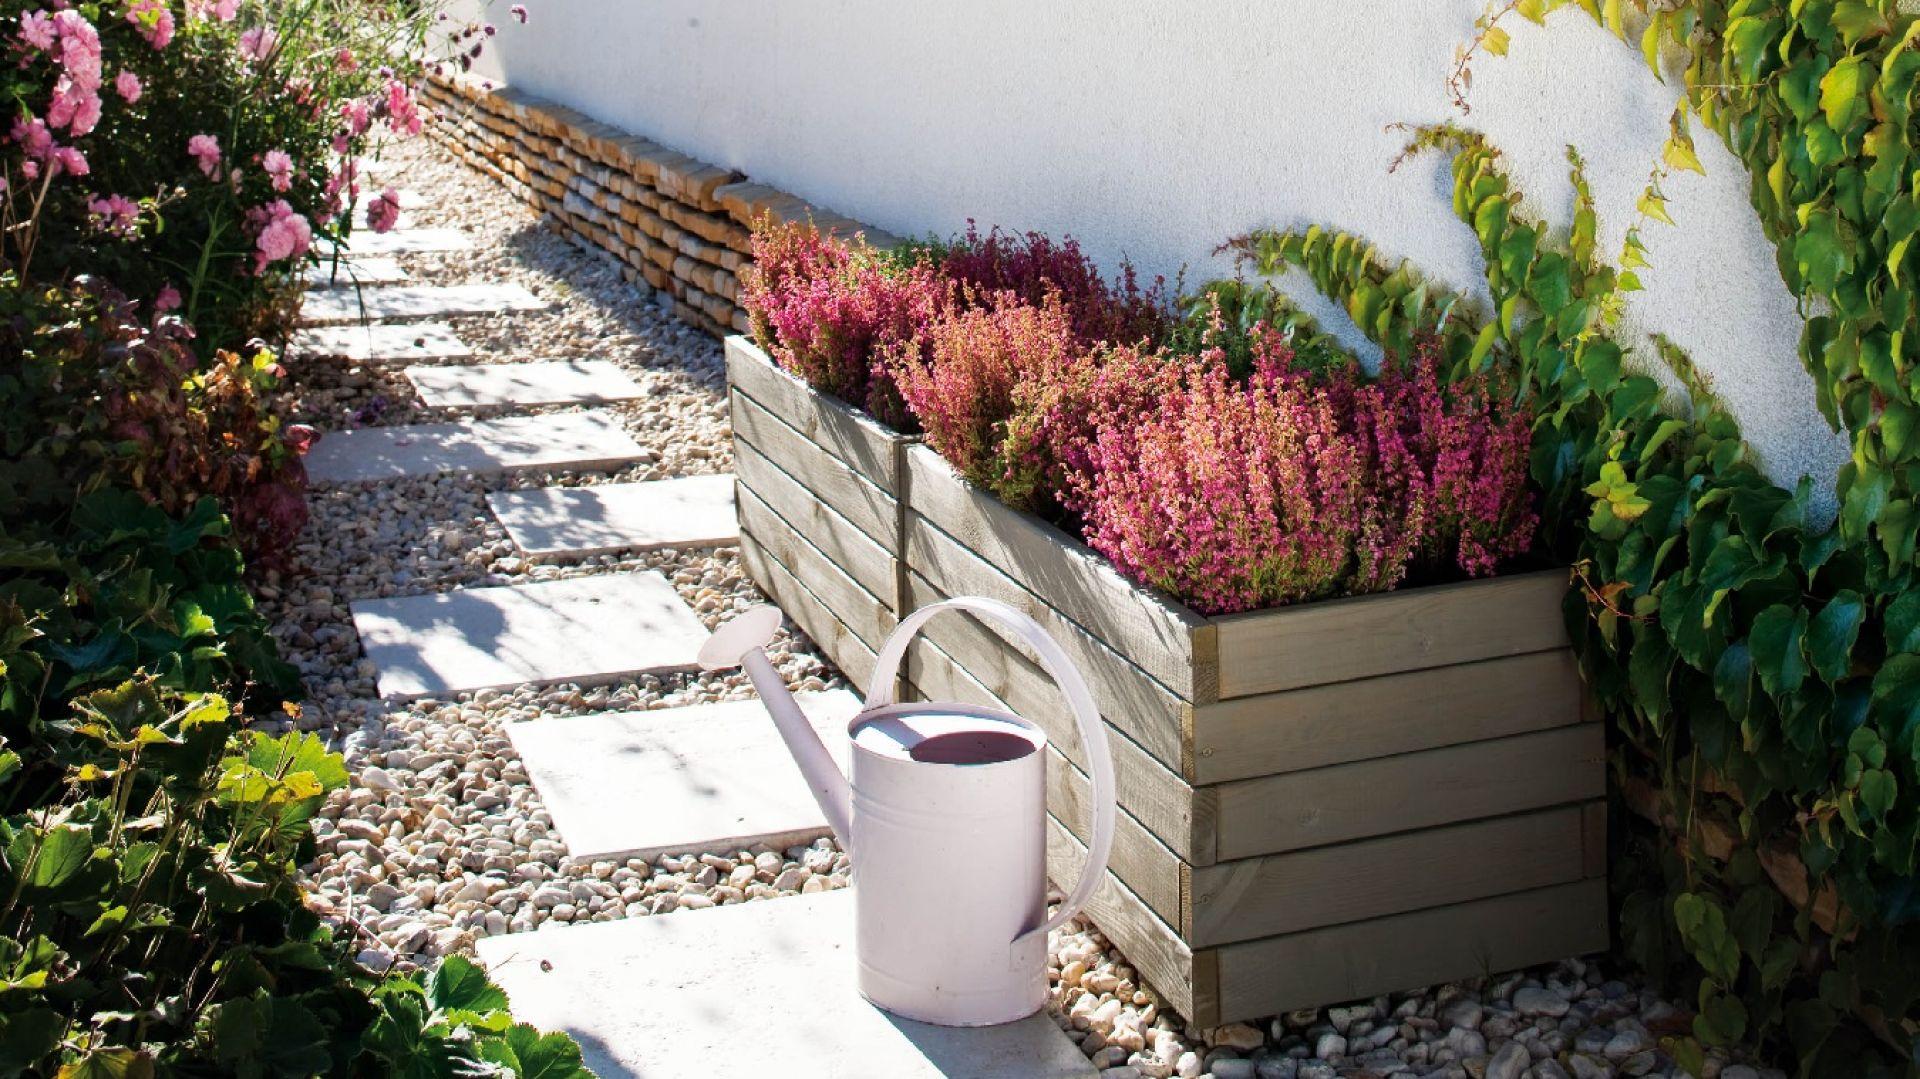 Pomysły na odświeżenie terenu wokół domu: Tikkurila Valtti Color Aqua, kolor 5152. Fot. Tikkurila